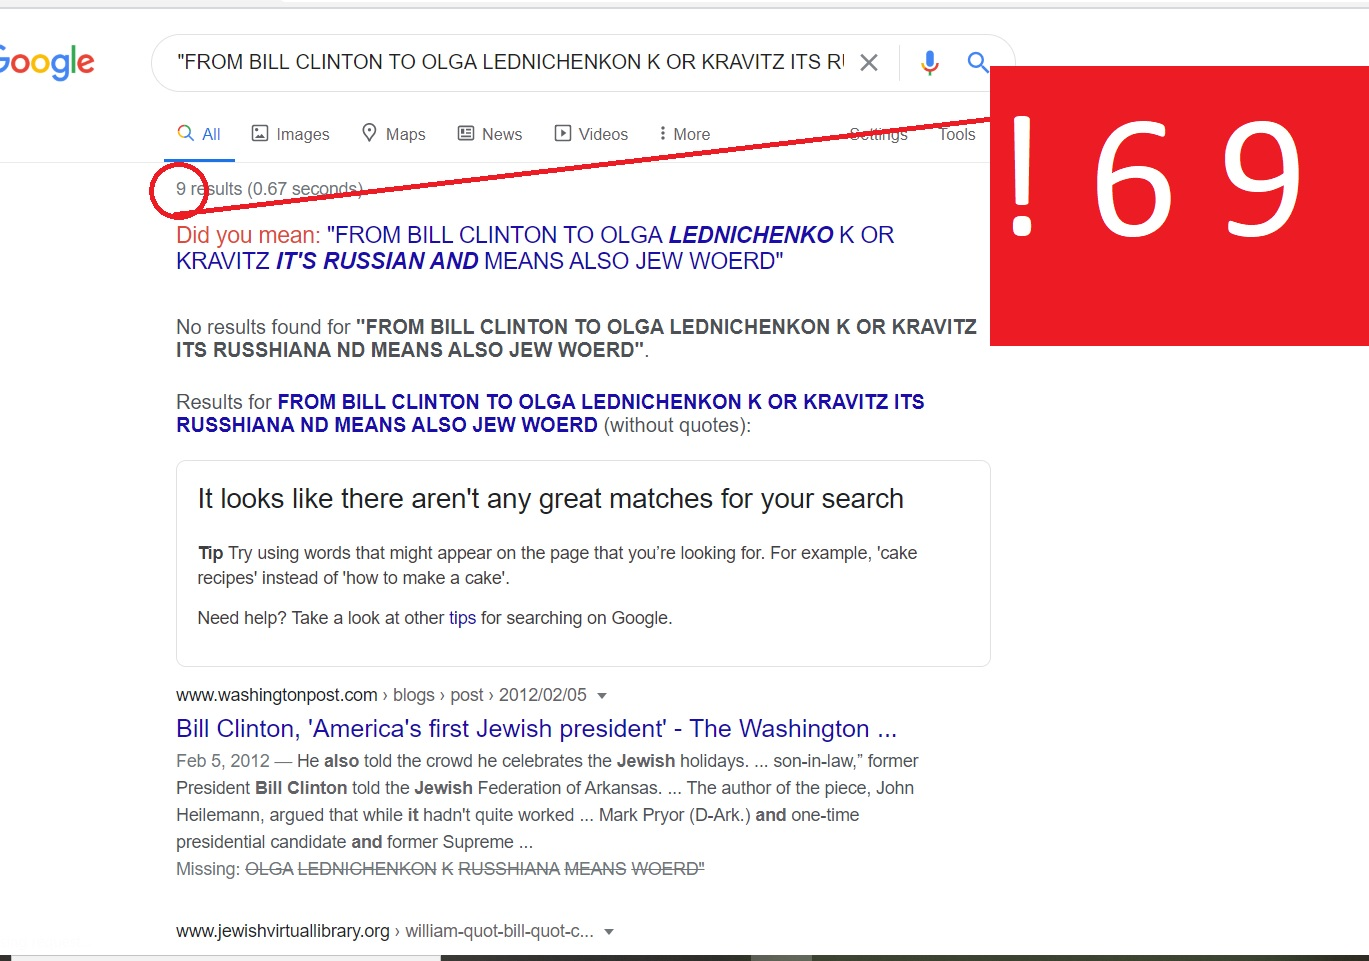 FROM BILL CLINTON TO OLGA LEDNICHENKON K OR KRAVITZ ITS RUSSHIANA ND MEANS ALSO JEW WOERD